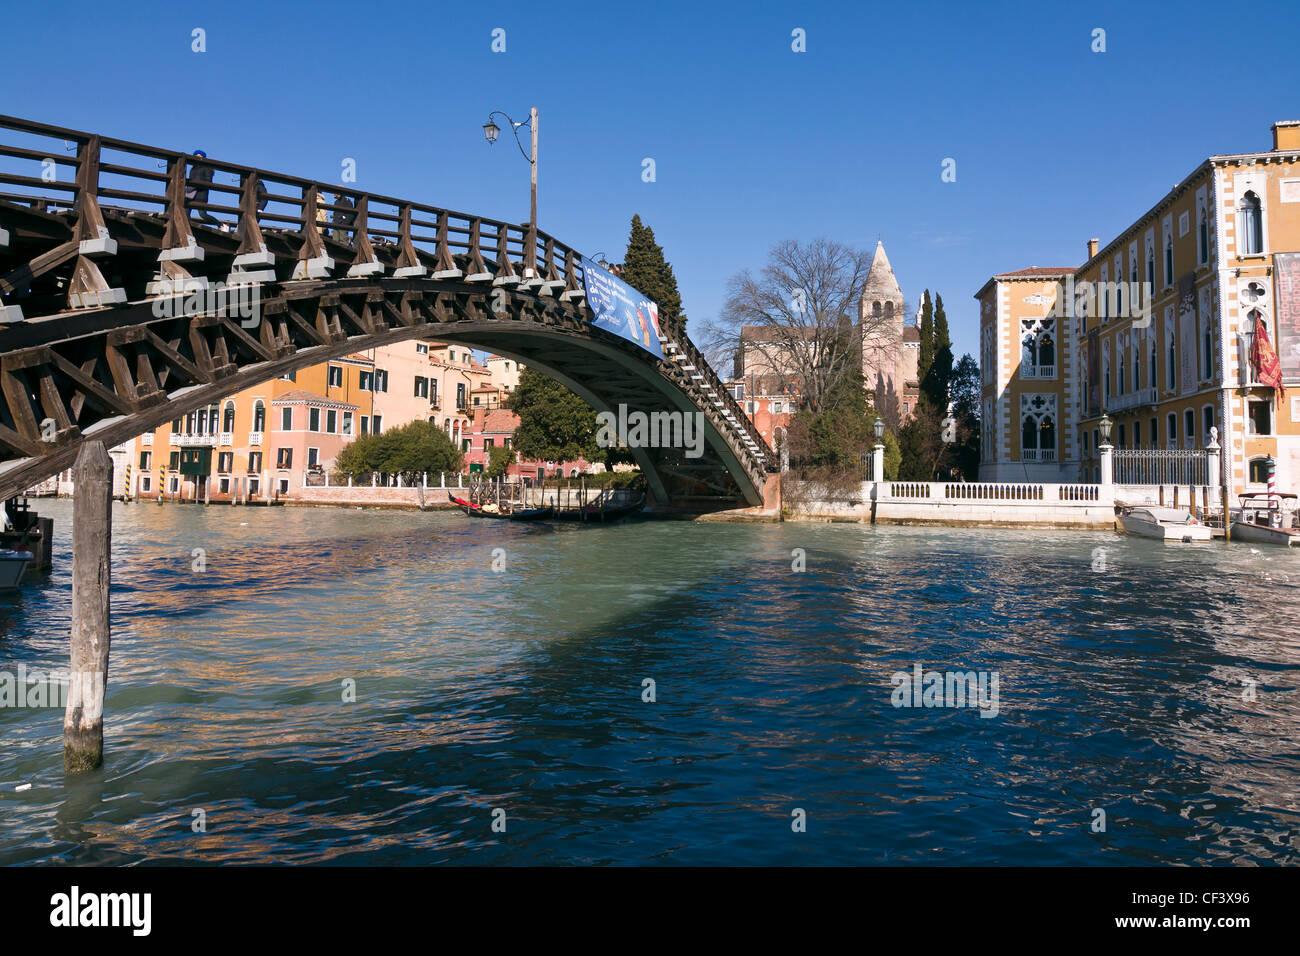 Ponte dell'Academia bridge over Grand Canal, connecting Dorsoduro and San Marco districts - Venice, Venezia, Italy, Stock Photo